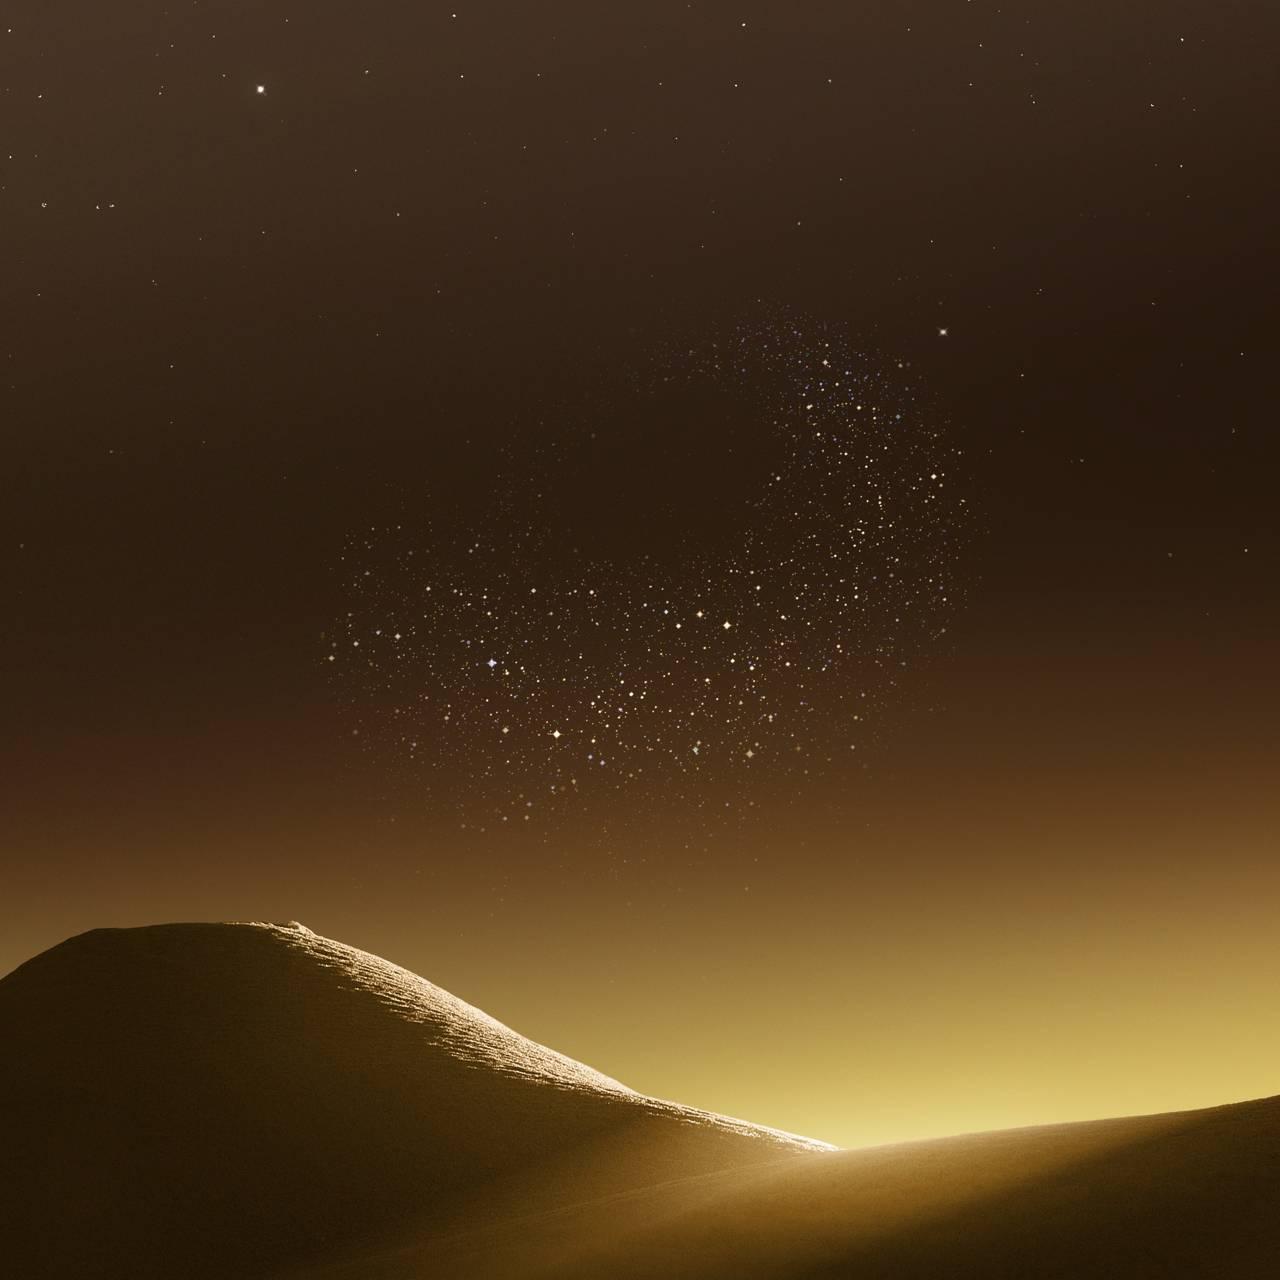 Galaxy S8 Infinity Wallpaper By Reaper7733 1d Free On Zedge